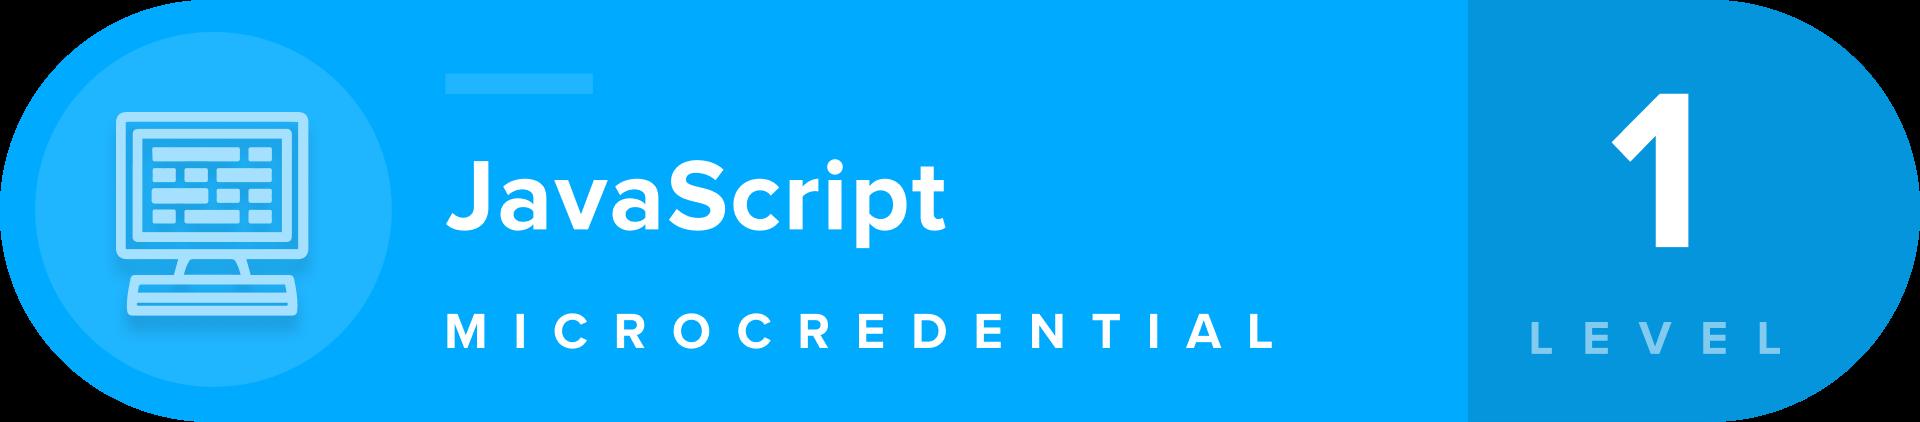 JavaScript microcredentials level 1 badge